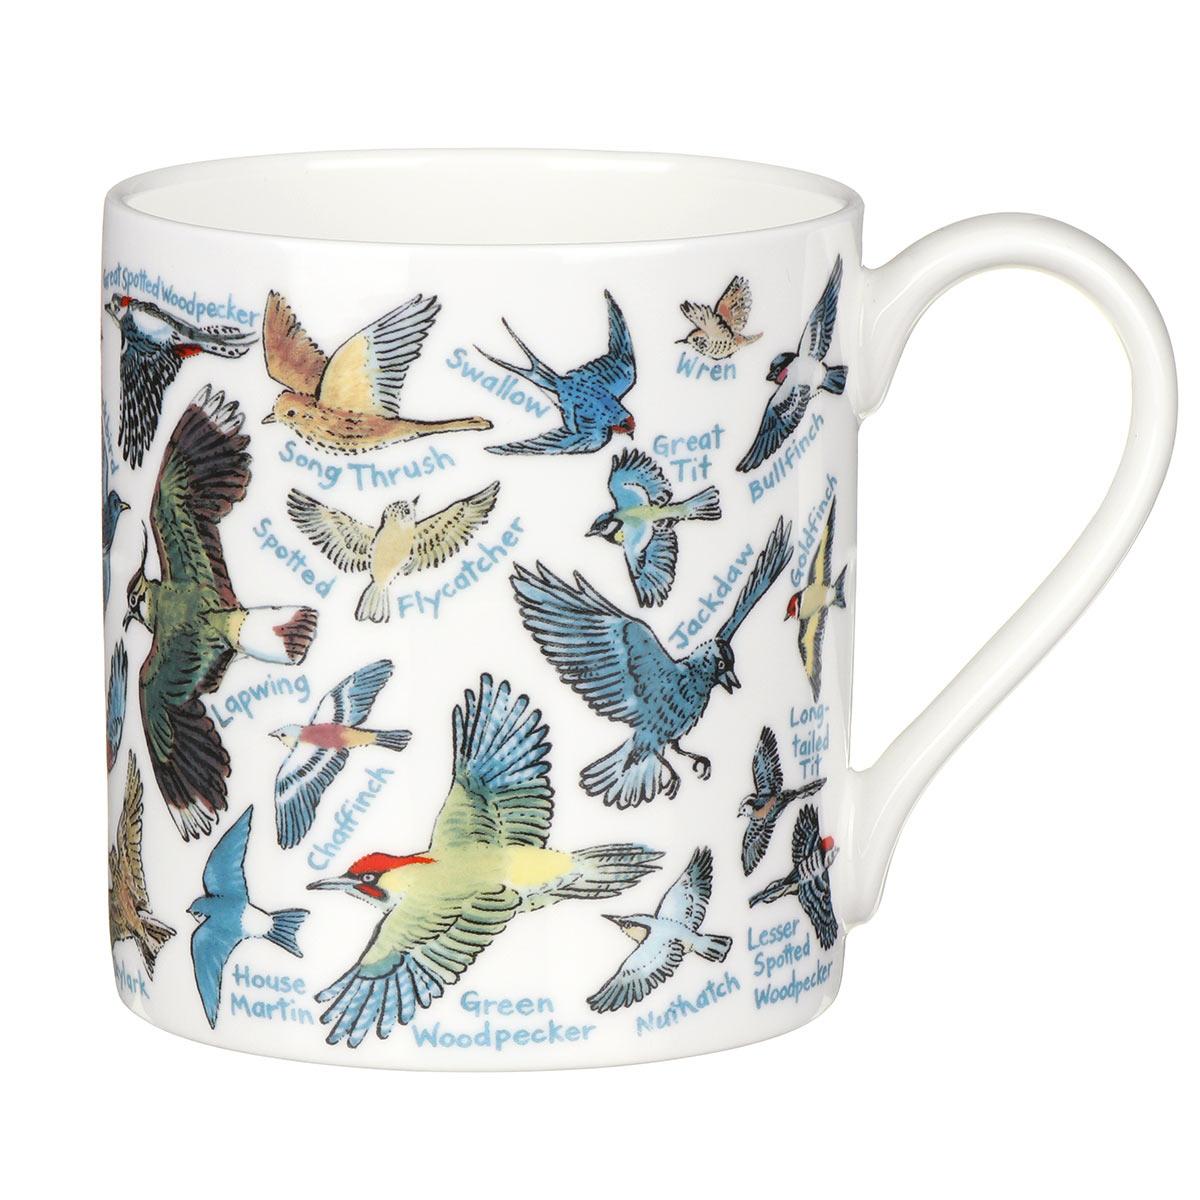 Mclaggan Smith Birds Large Mug